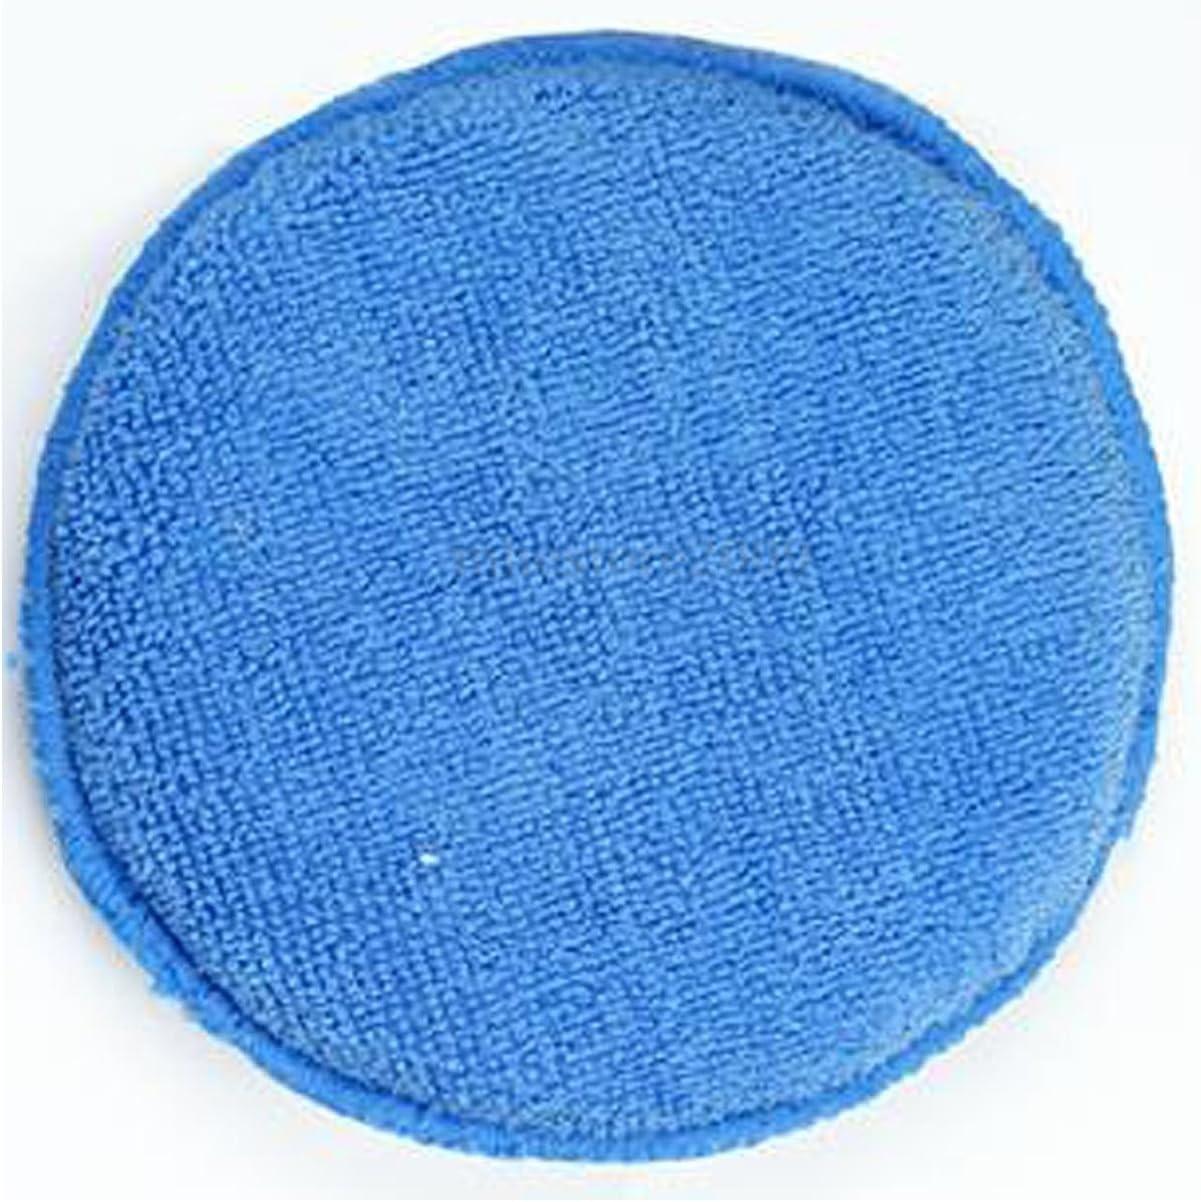 Fliyeong 10x Car Wax Polished Microfiber Foam Sponge Applicator Cleaning Pad Details Convenient Convenient and Practical